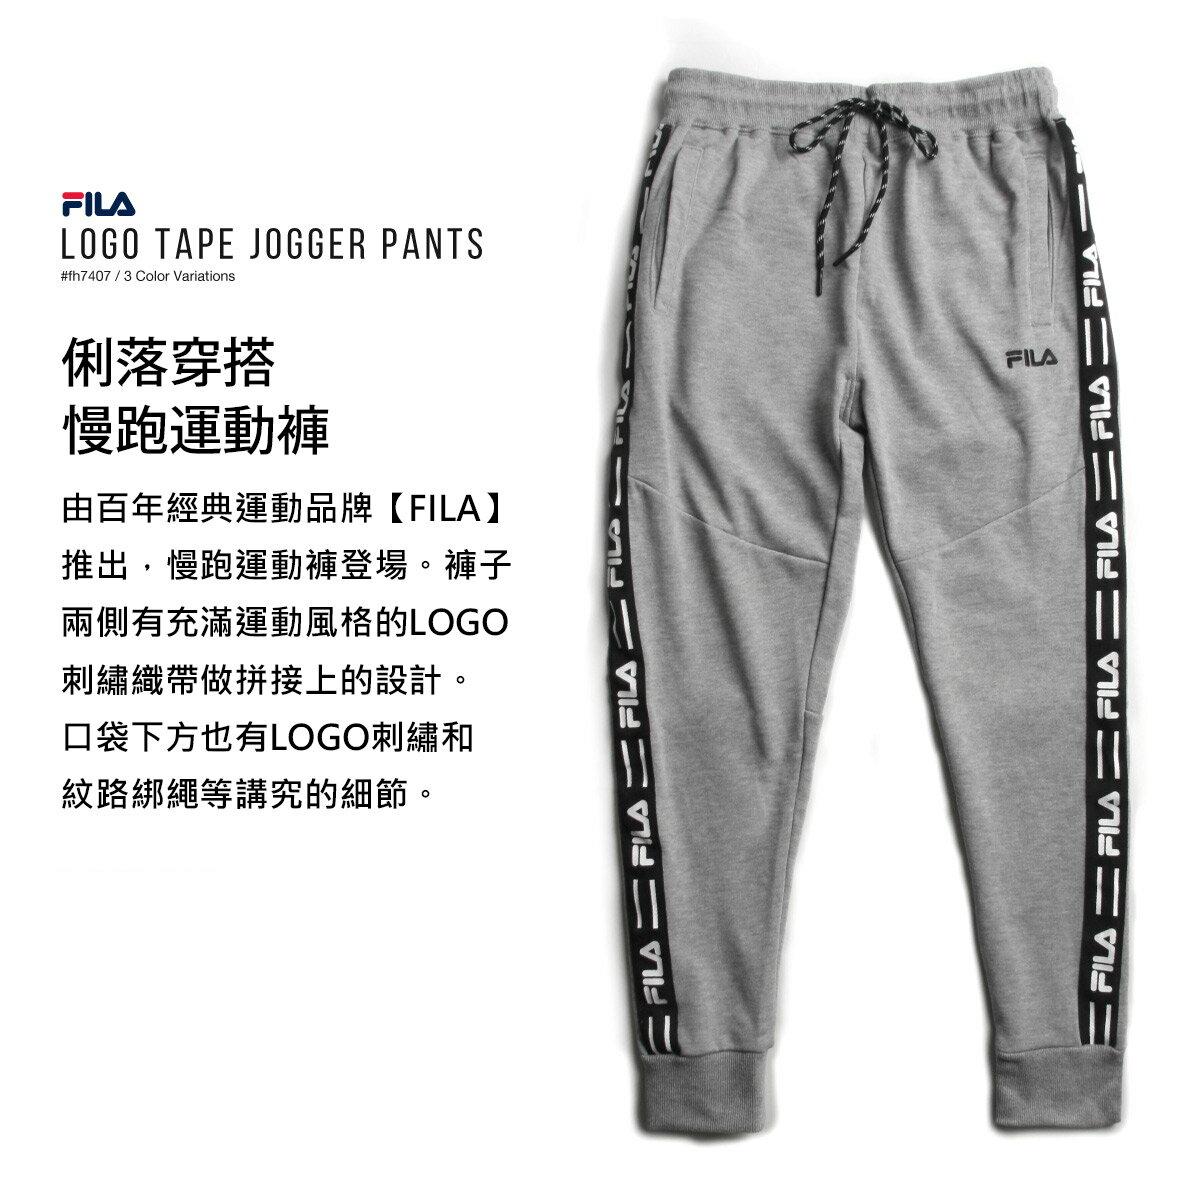 【FILA】LOGO貼條慢跑運動長褲 5